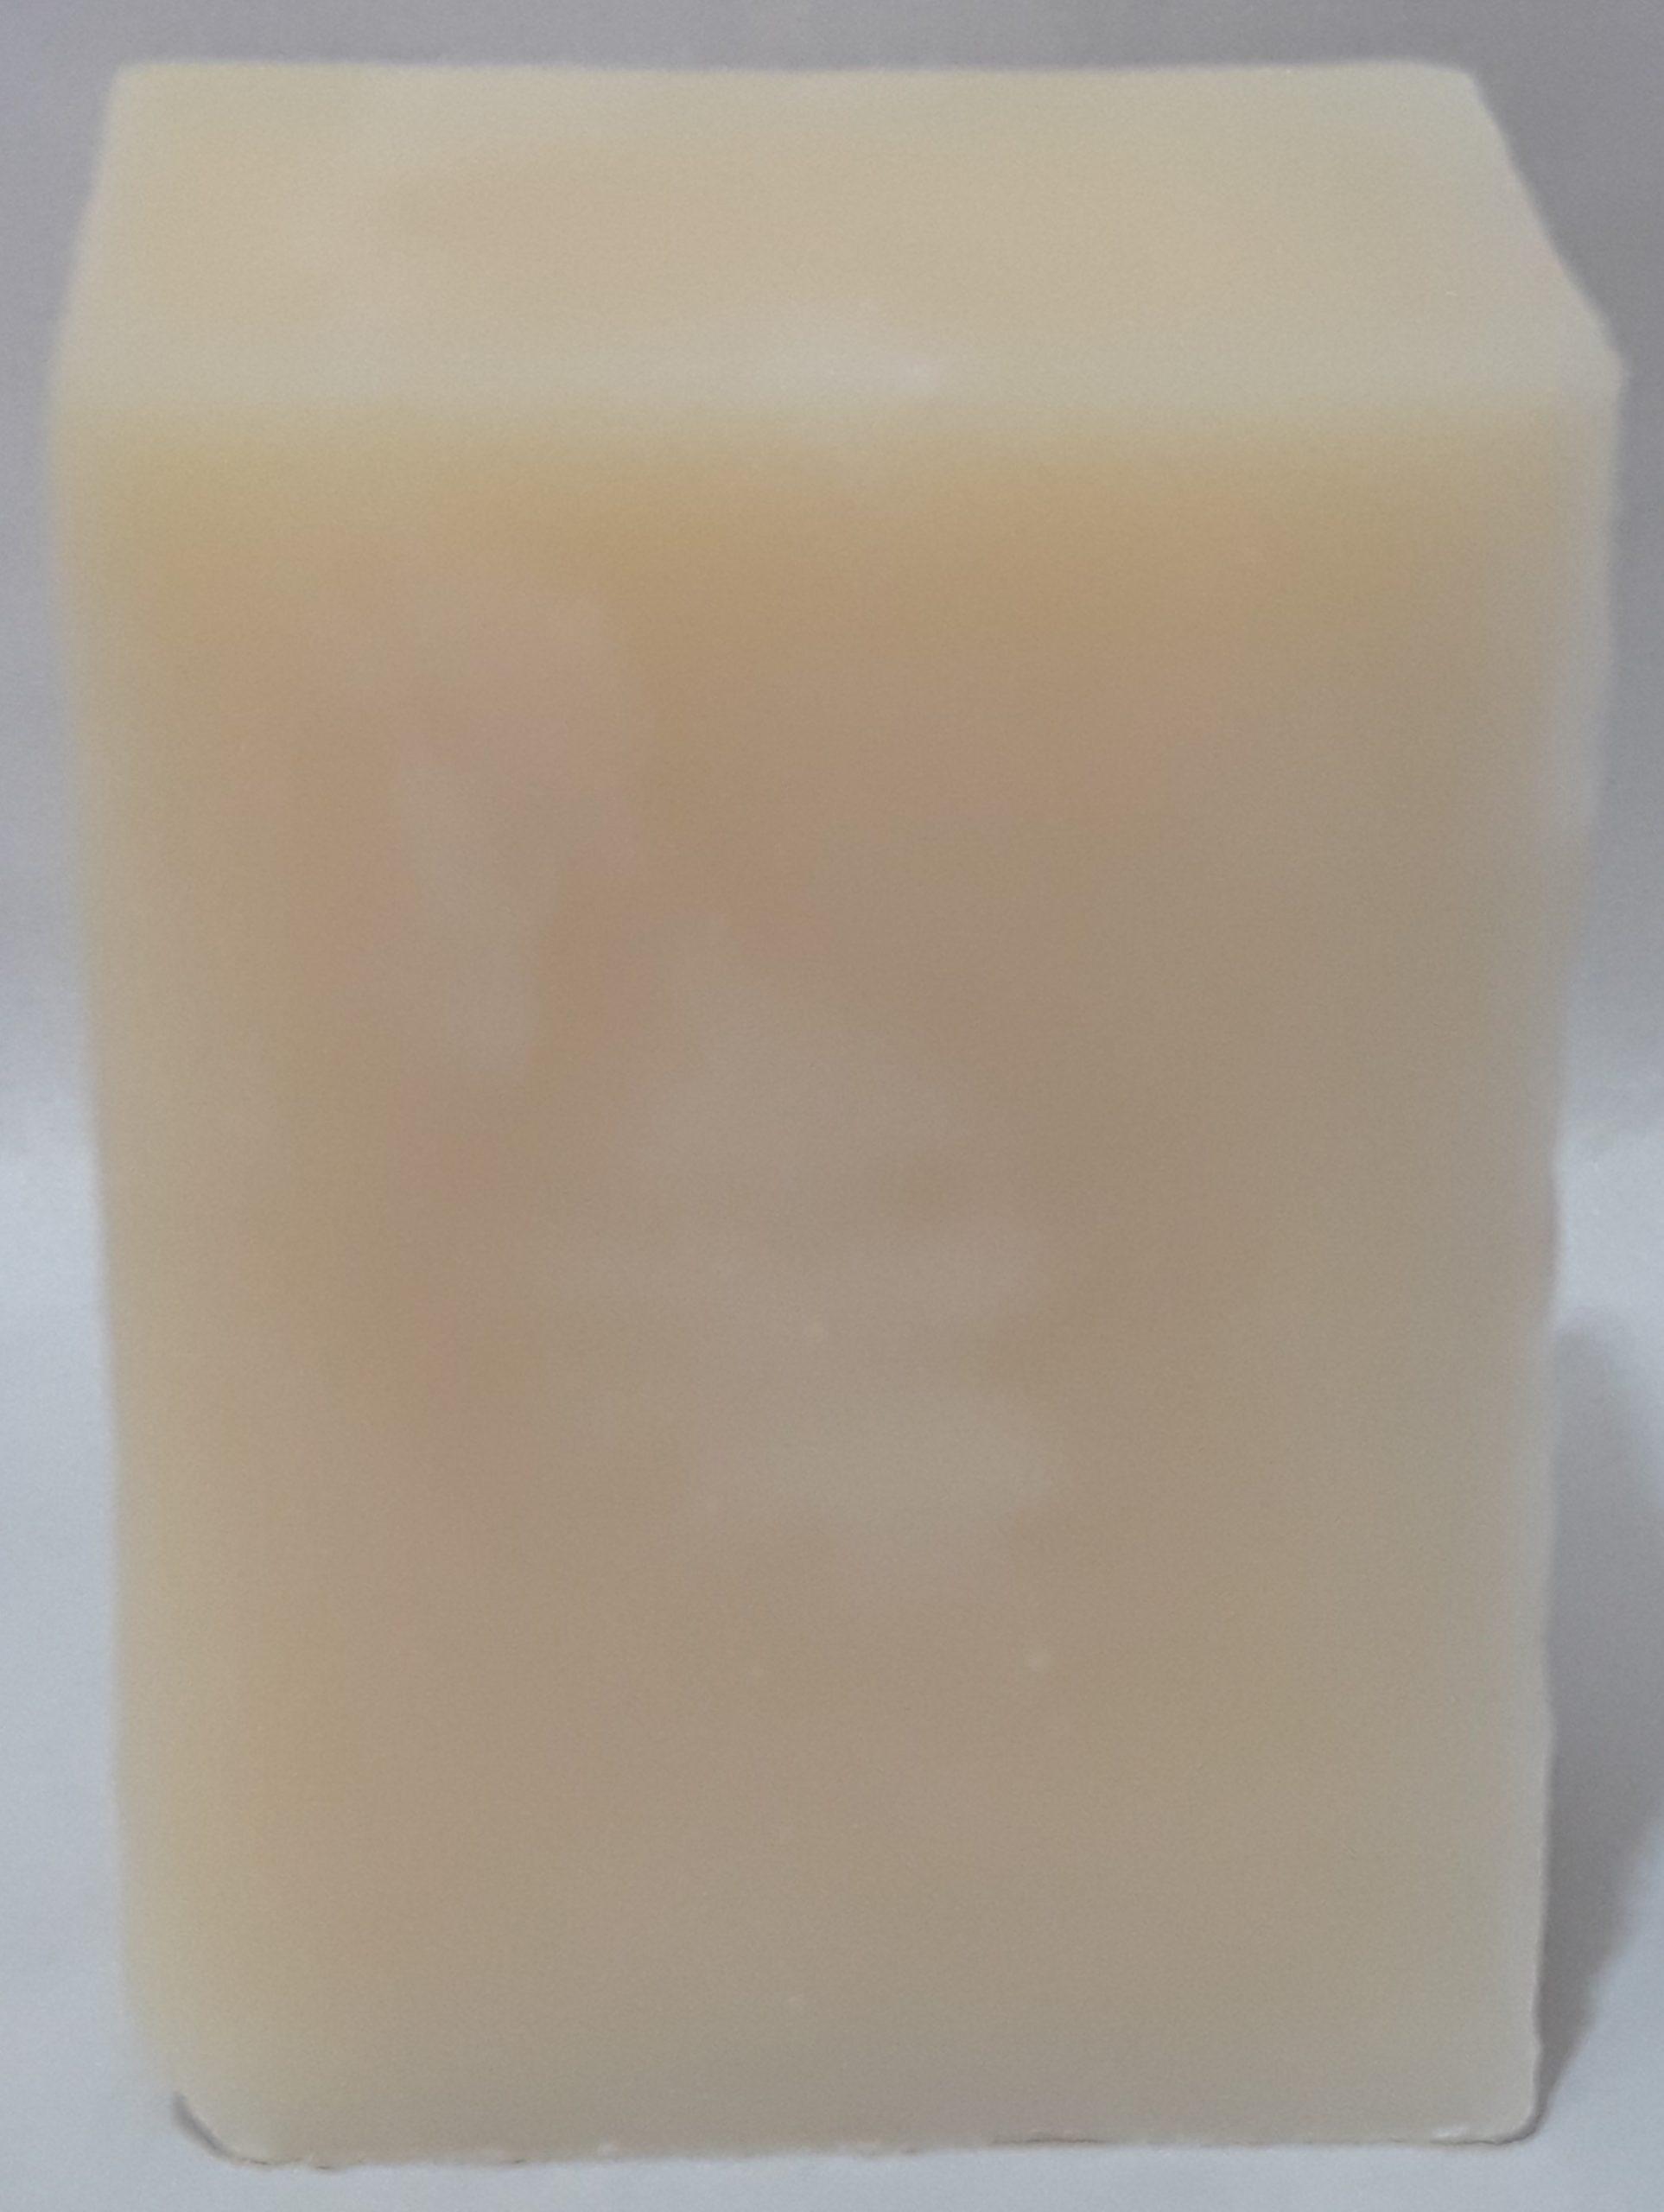 BLM soap